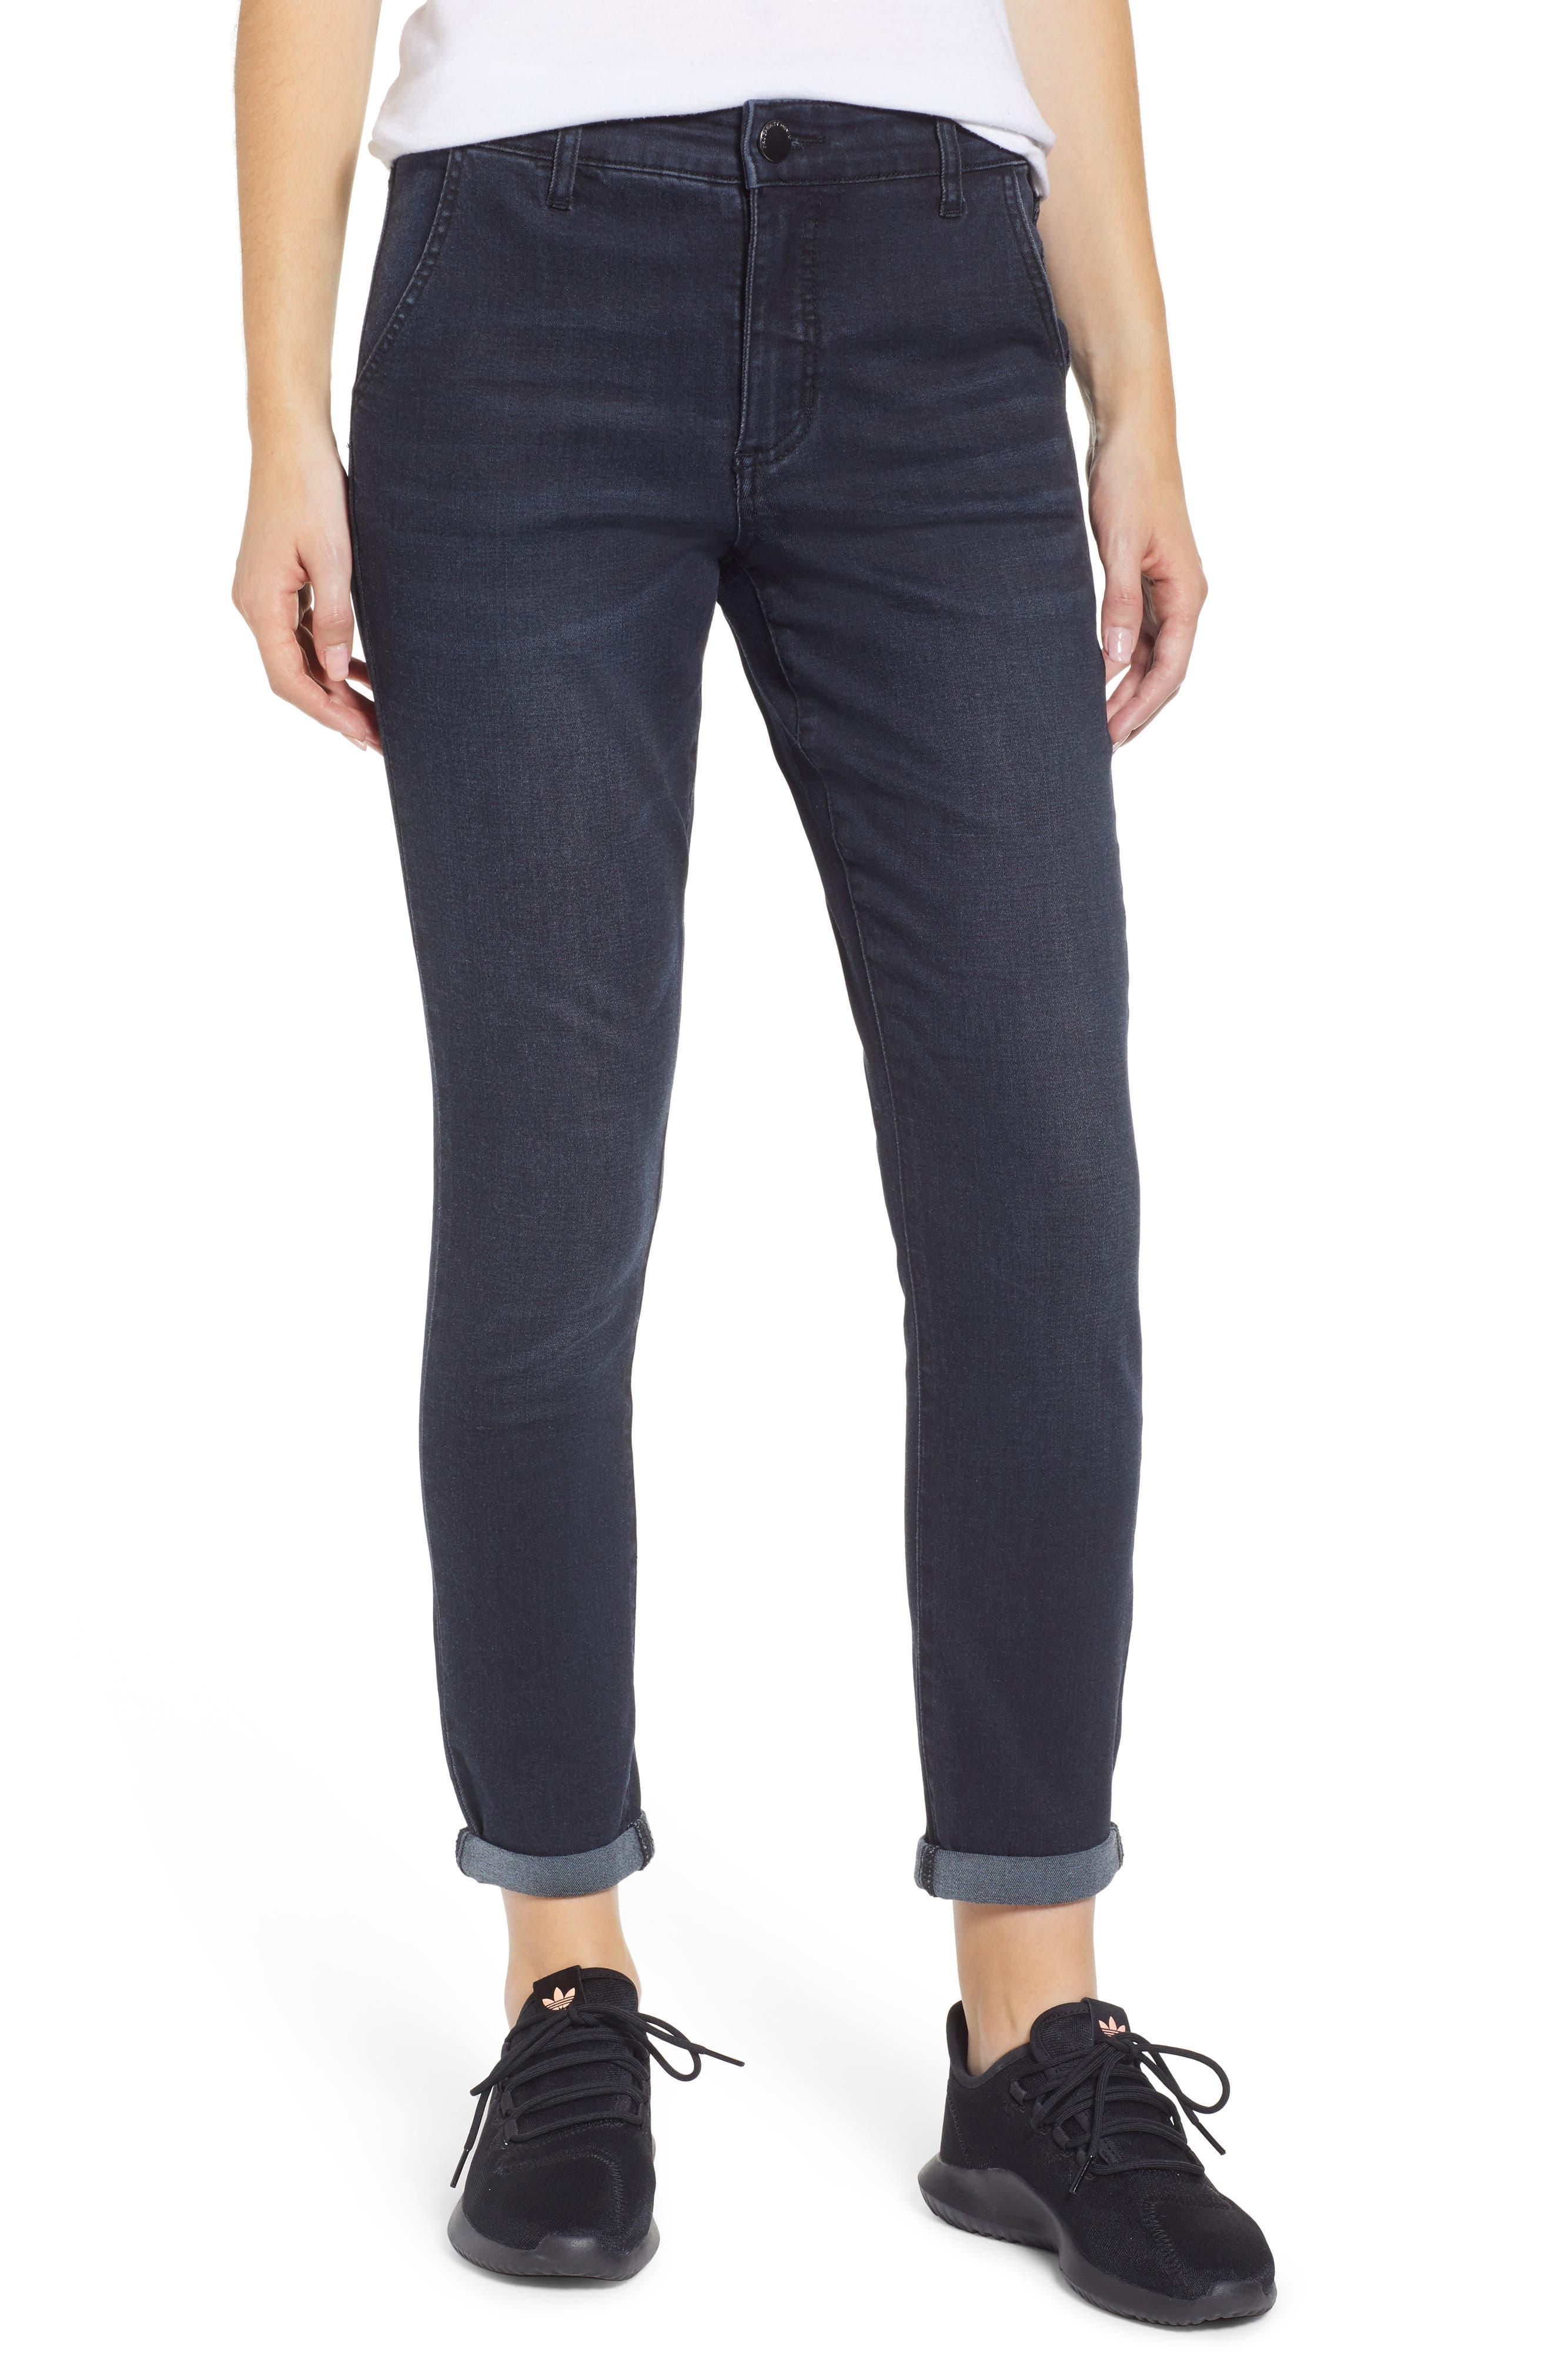 PROSPERITY DENIM, High Waist Ankle Boyfriend Jeans, Main thumbnail 1, color, ROCKER WASH